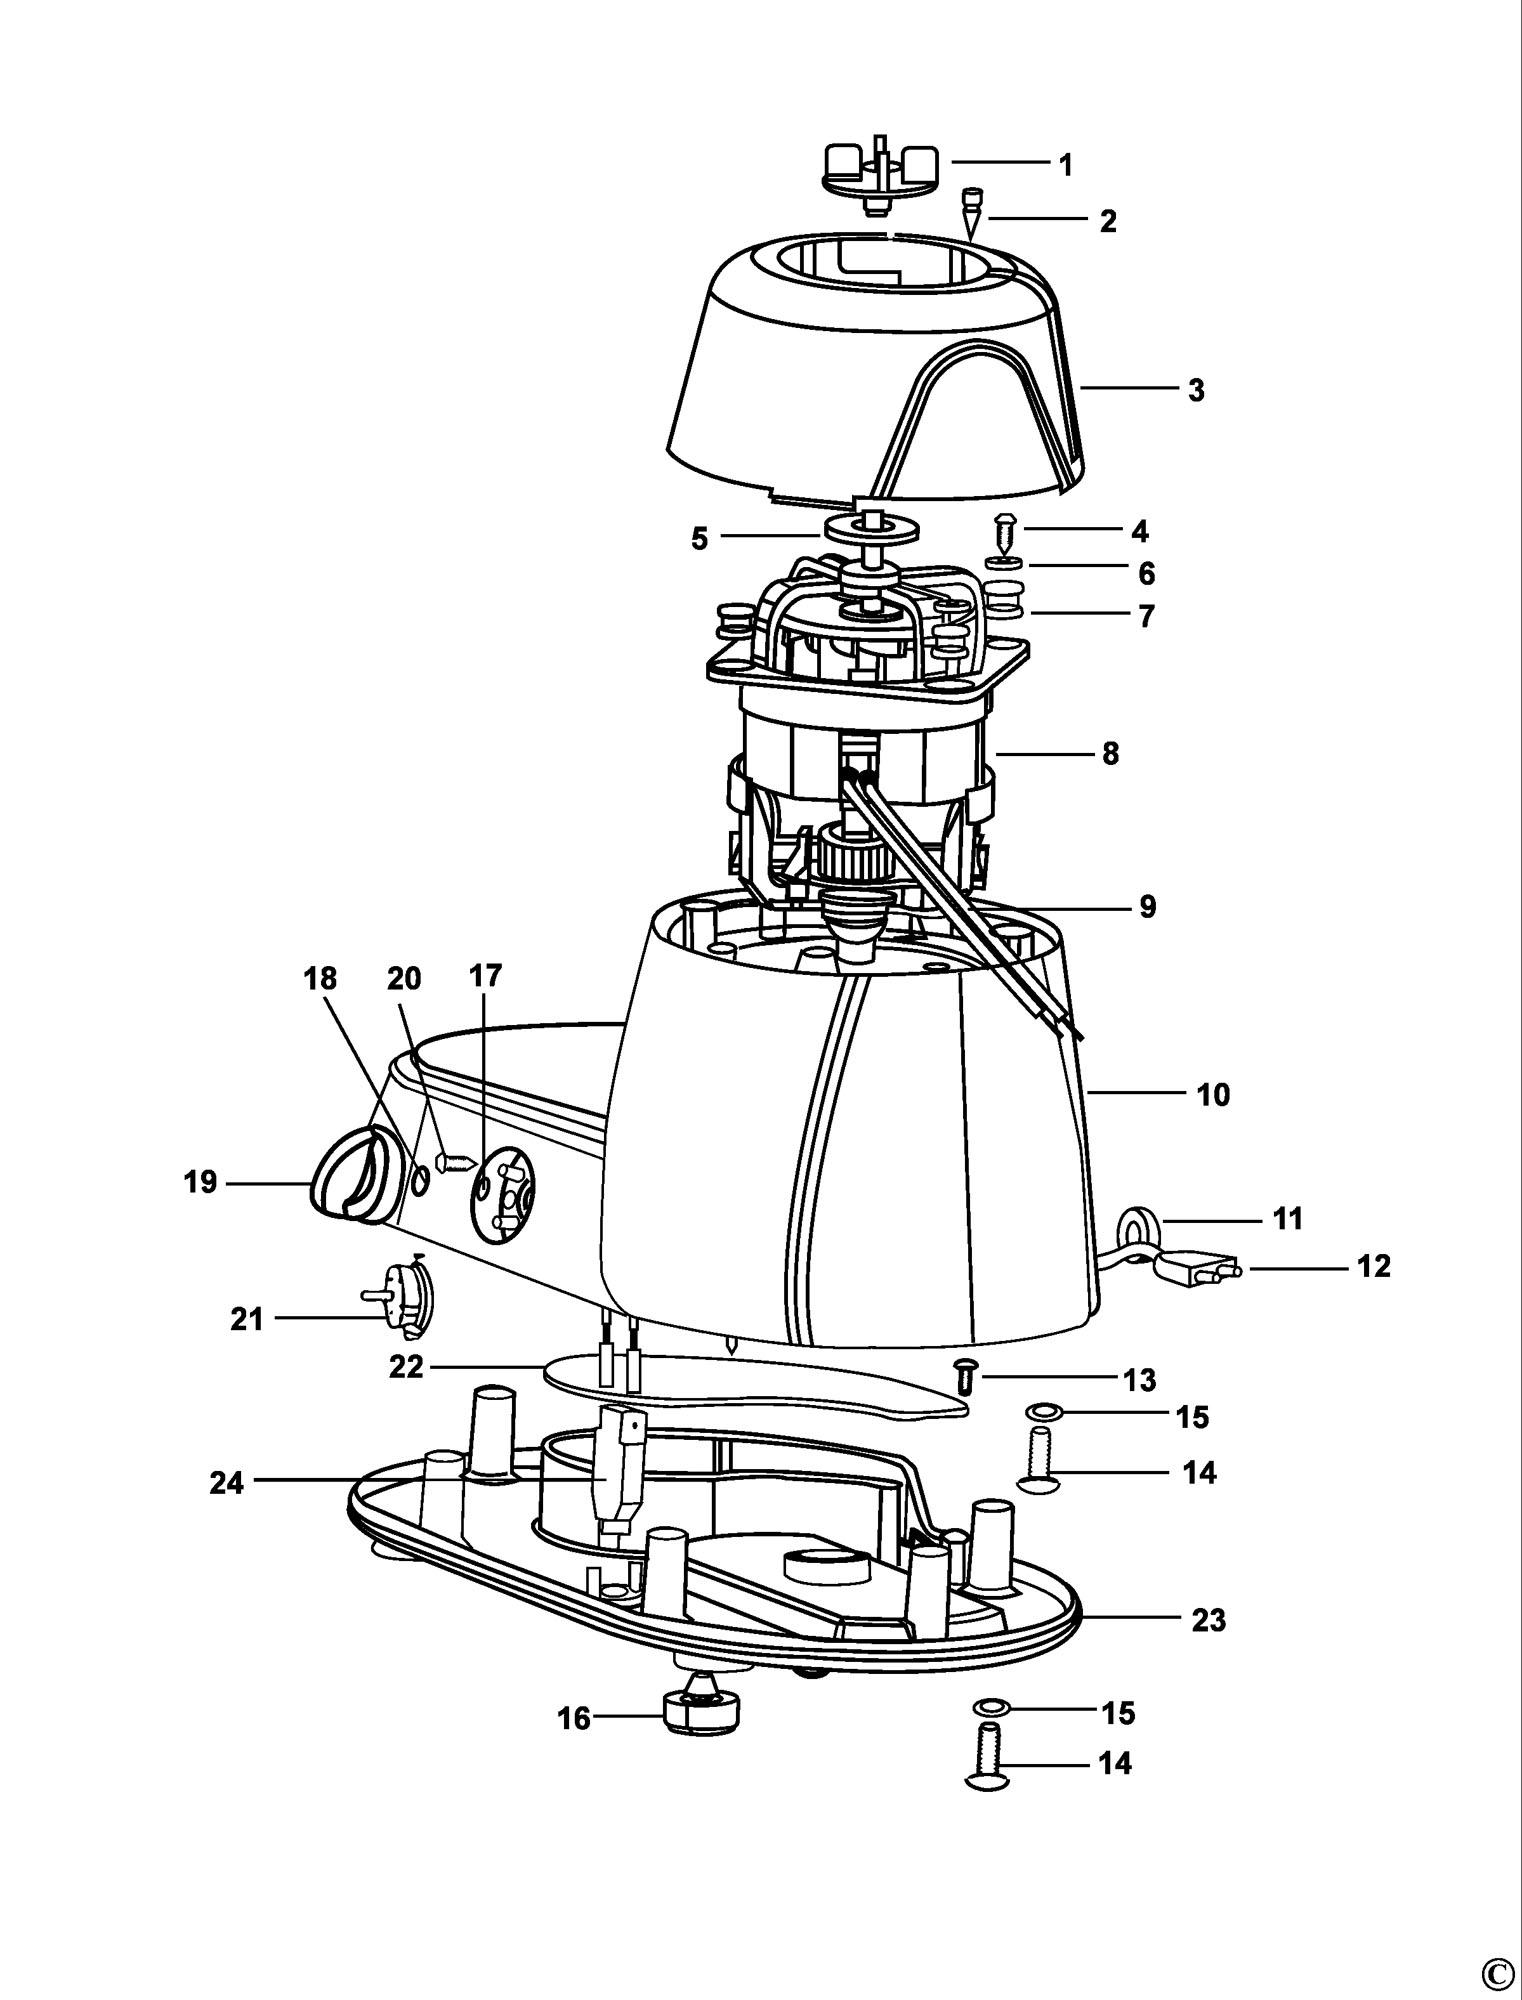 Spares For Black Amp Decker Fg550 Mixer Grinder Type 1